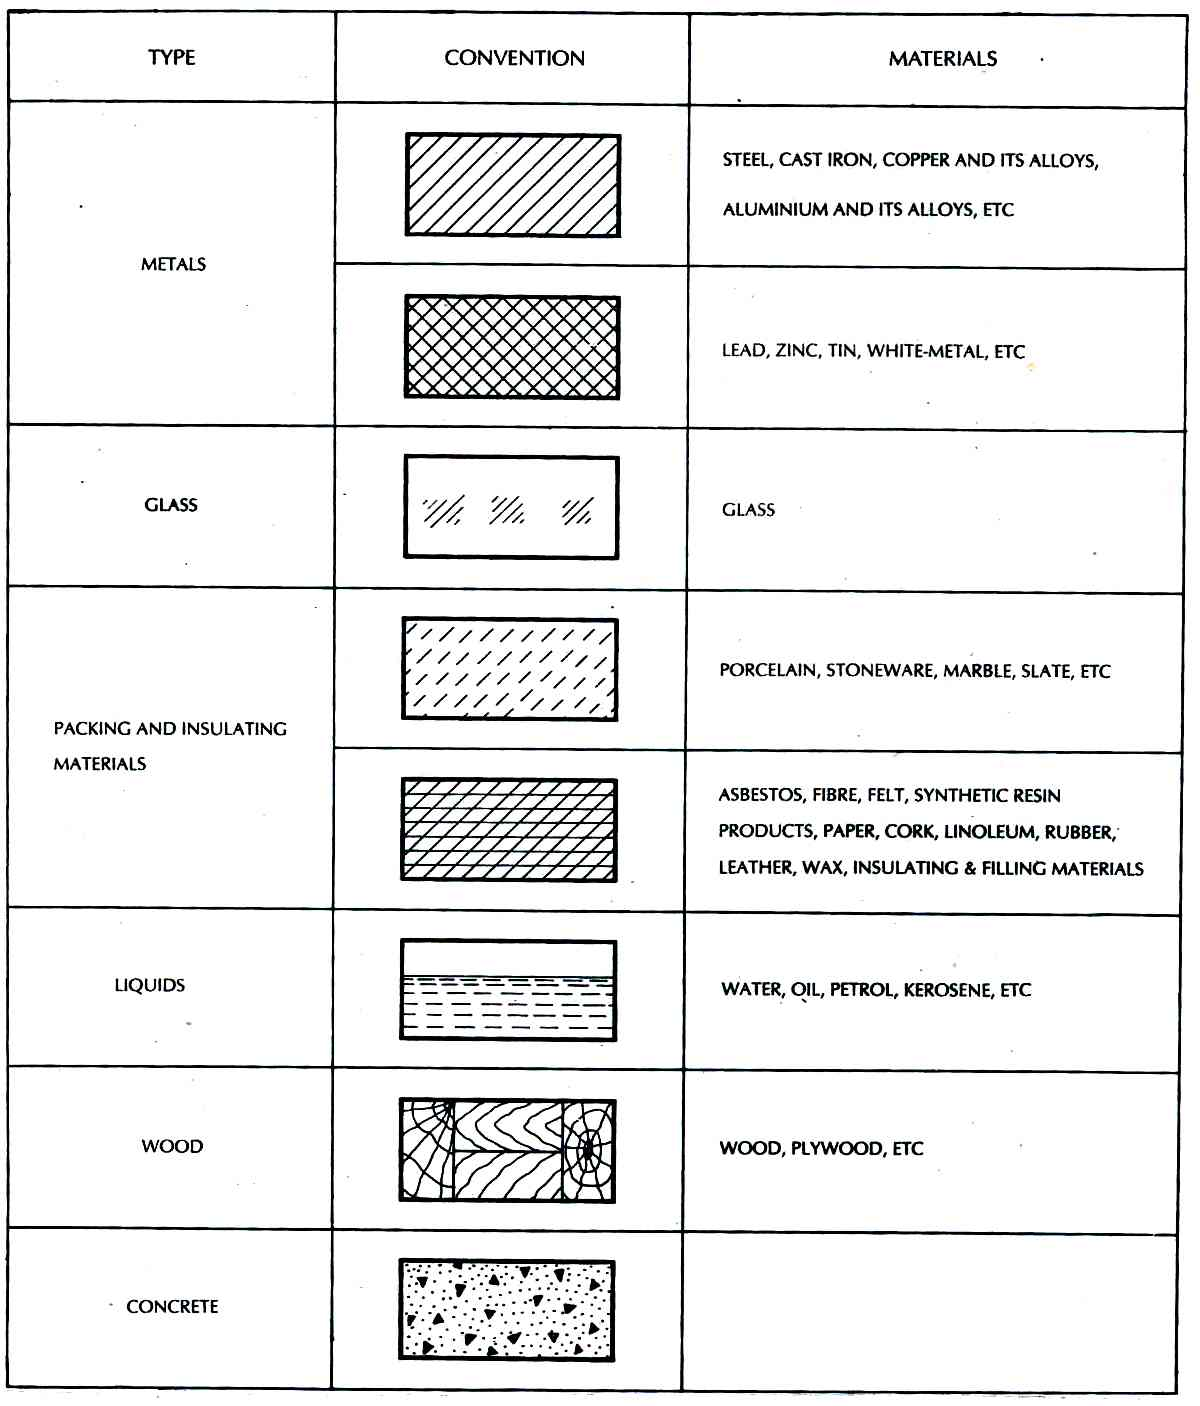 Technical Drawing Material Representation